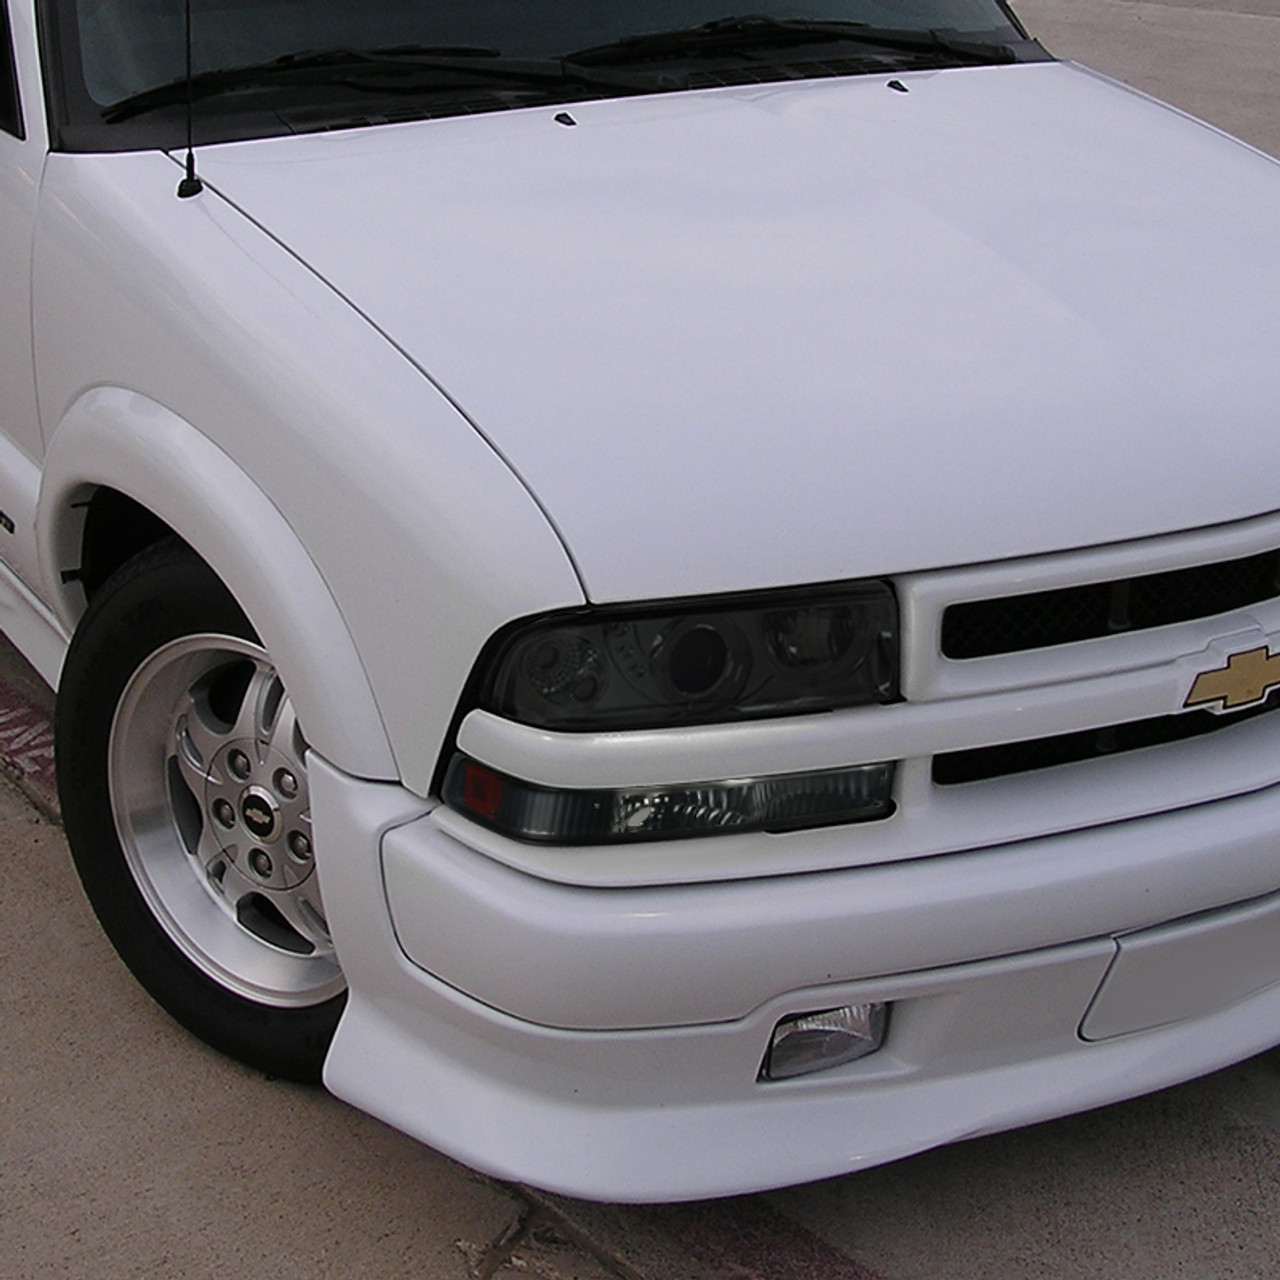 1998 2004 Chevrolet S10 Gmc Sonoma Bumper Lights Chrome Housing Smoke Lens Spec D Tuning